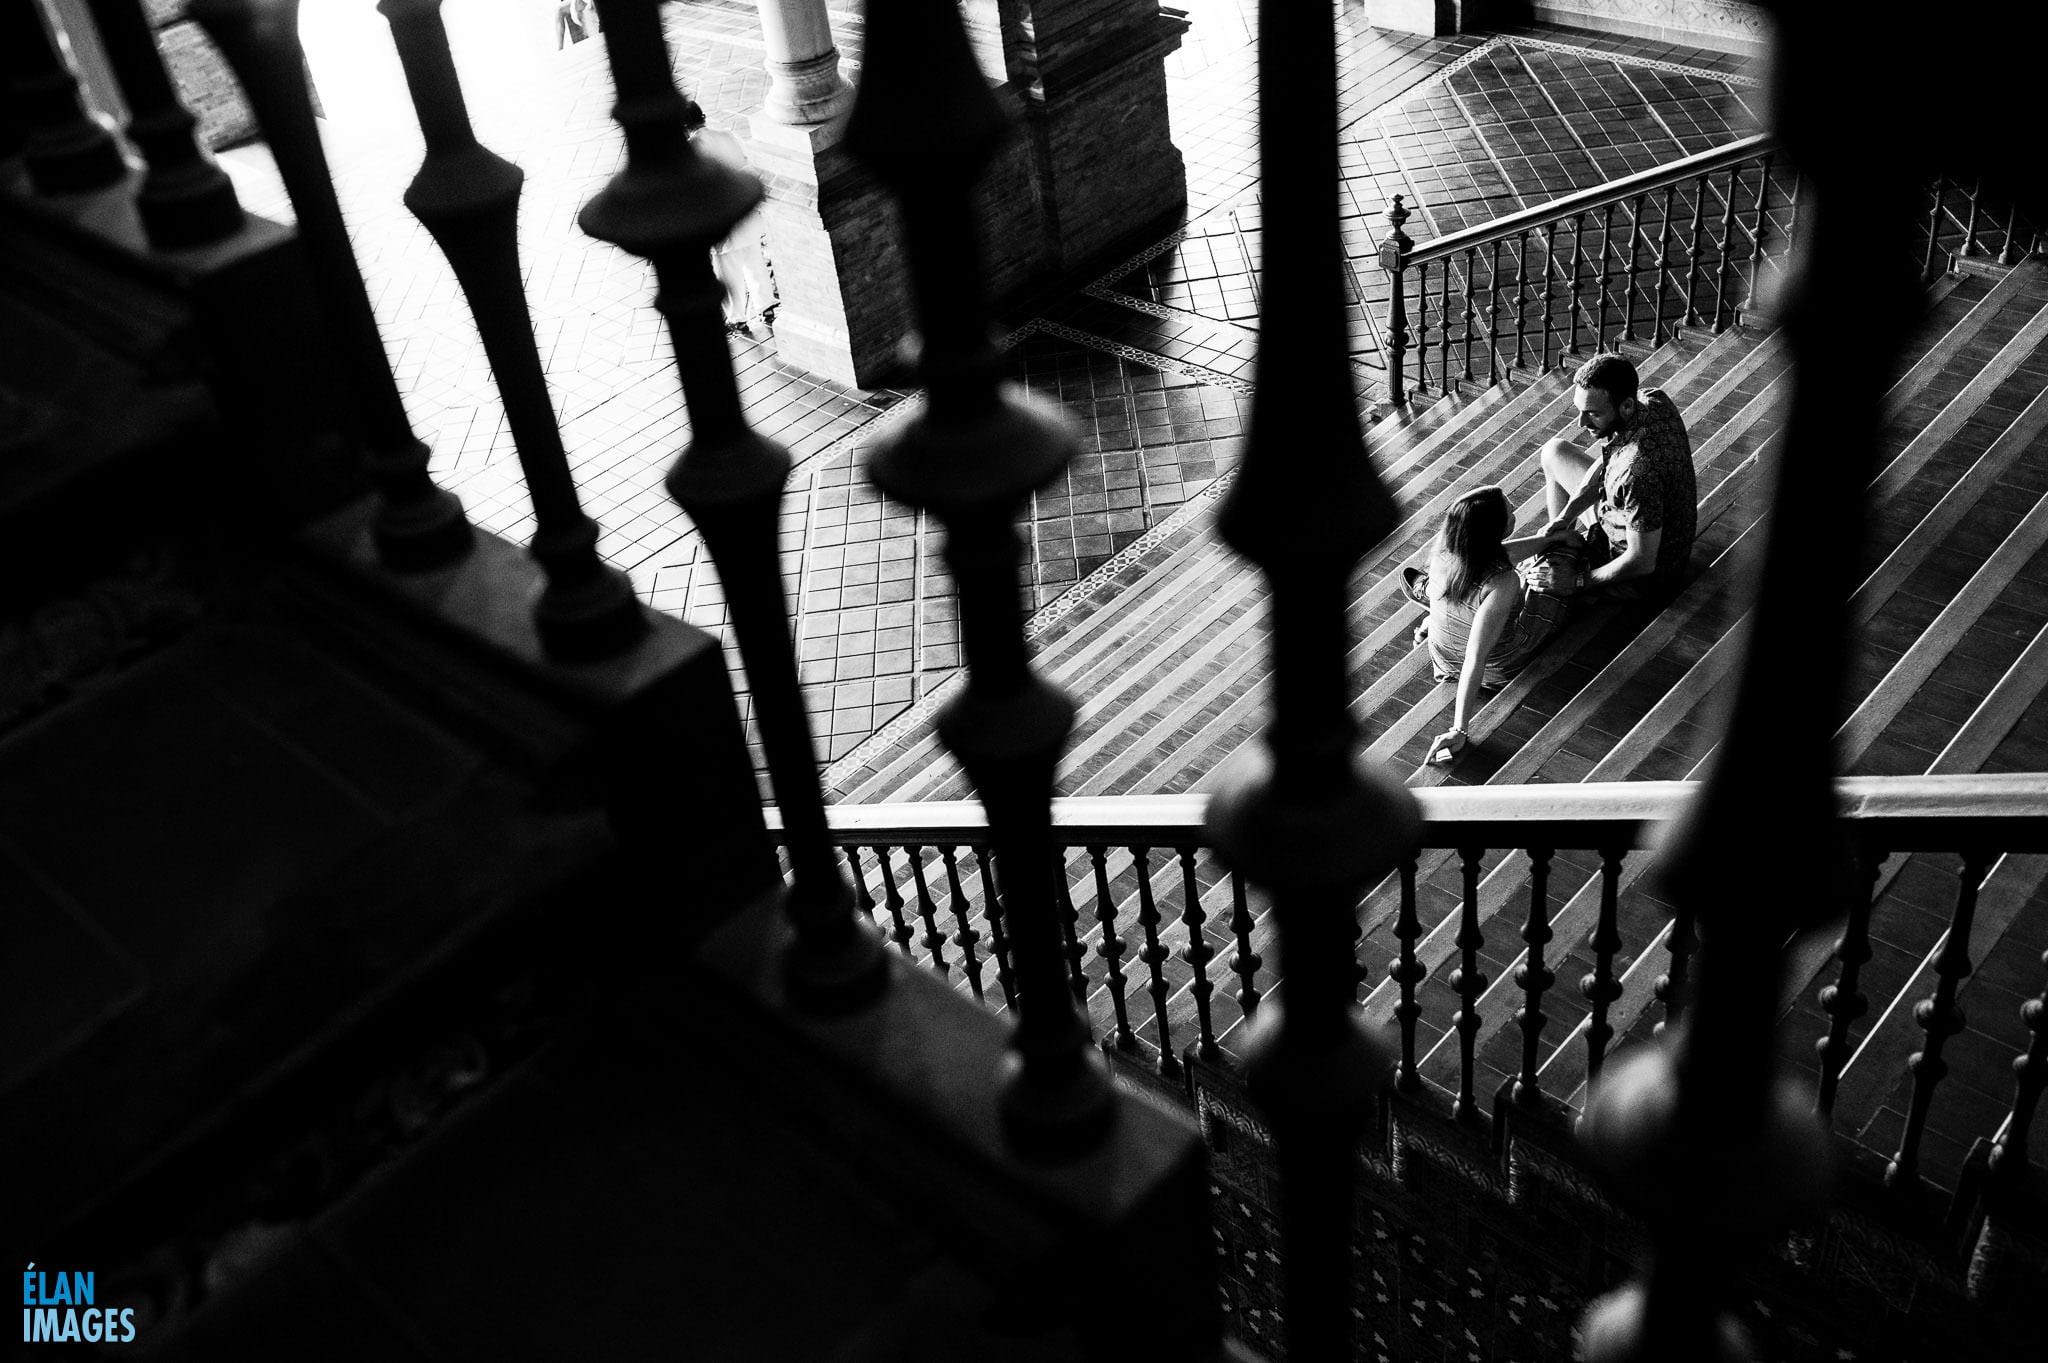 Plaza de España, Seville – Engagement Photo Shoot 17